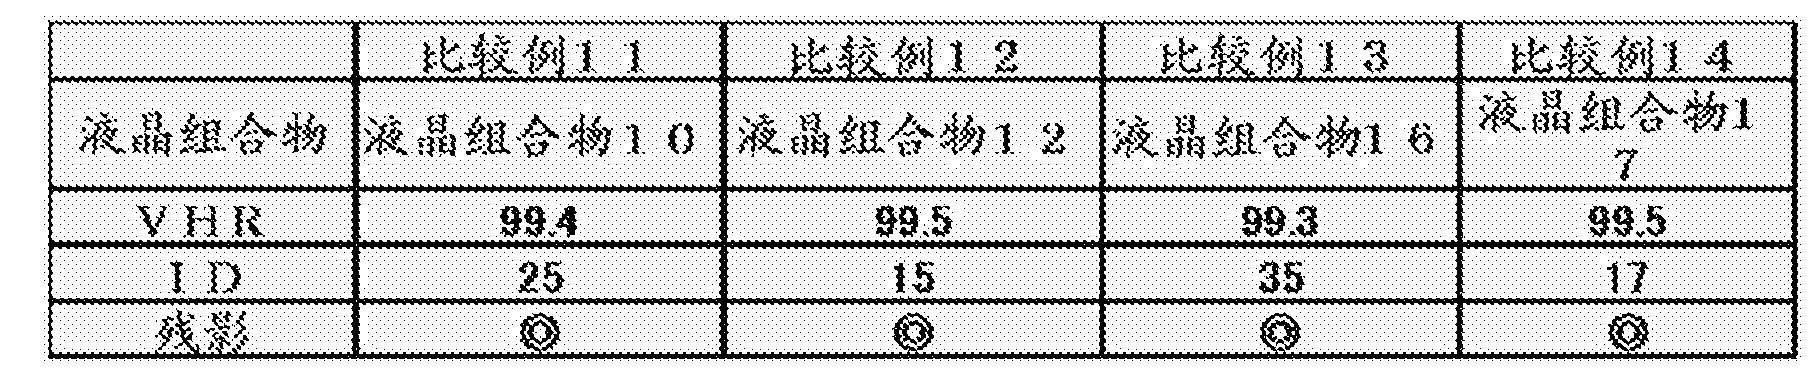 Figure CN105745572AD00491